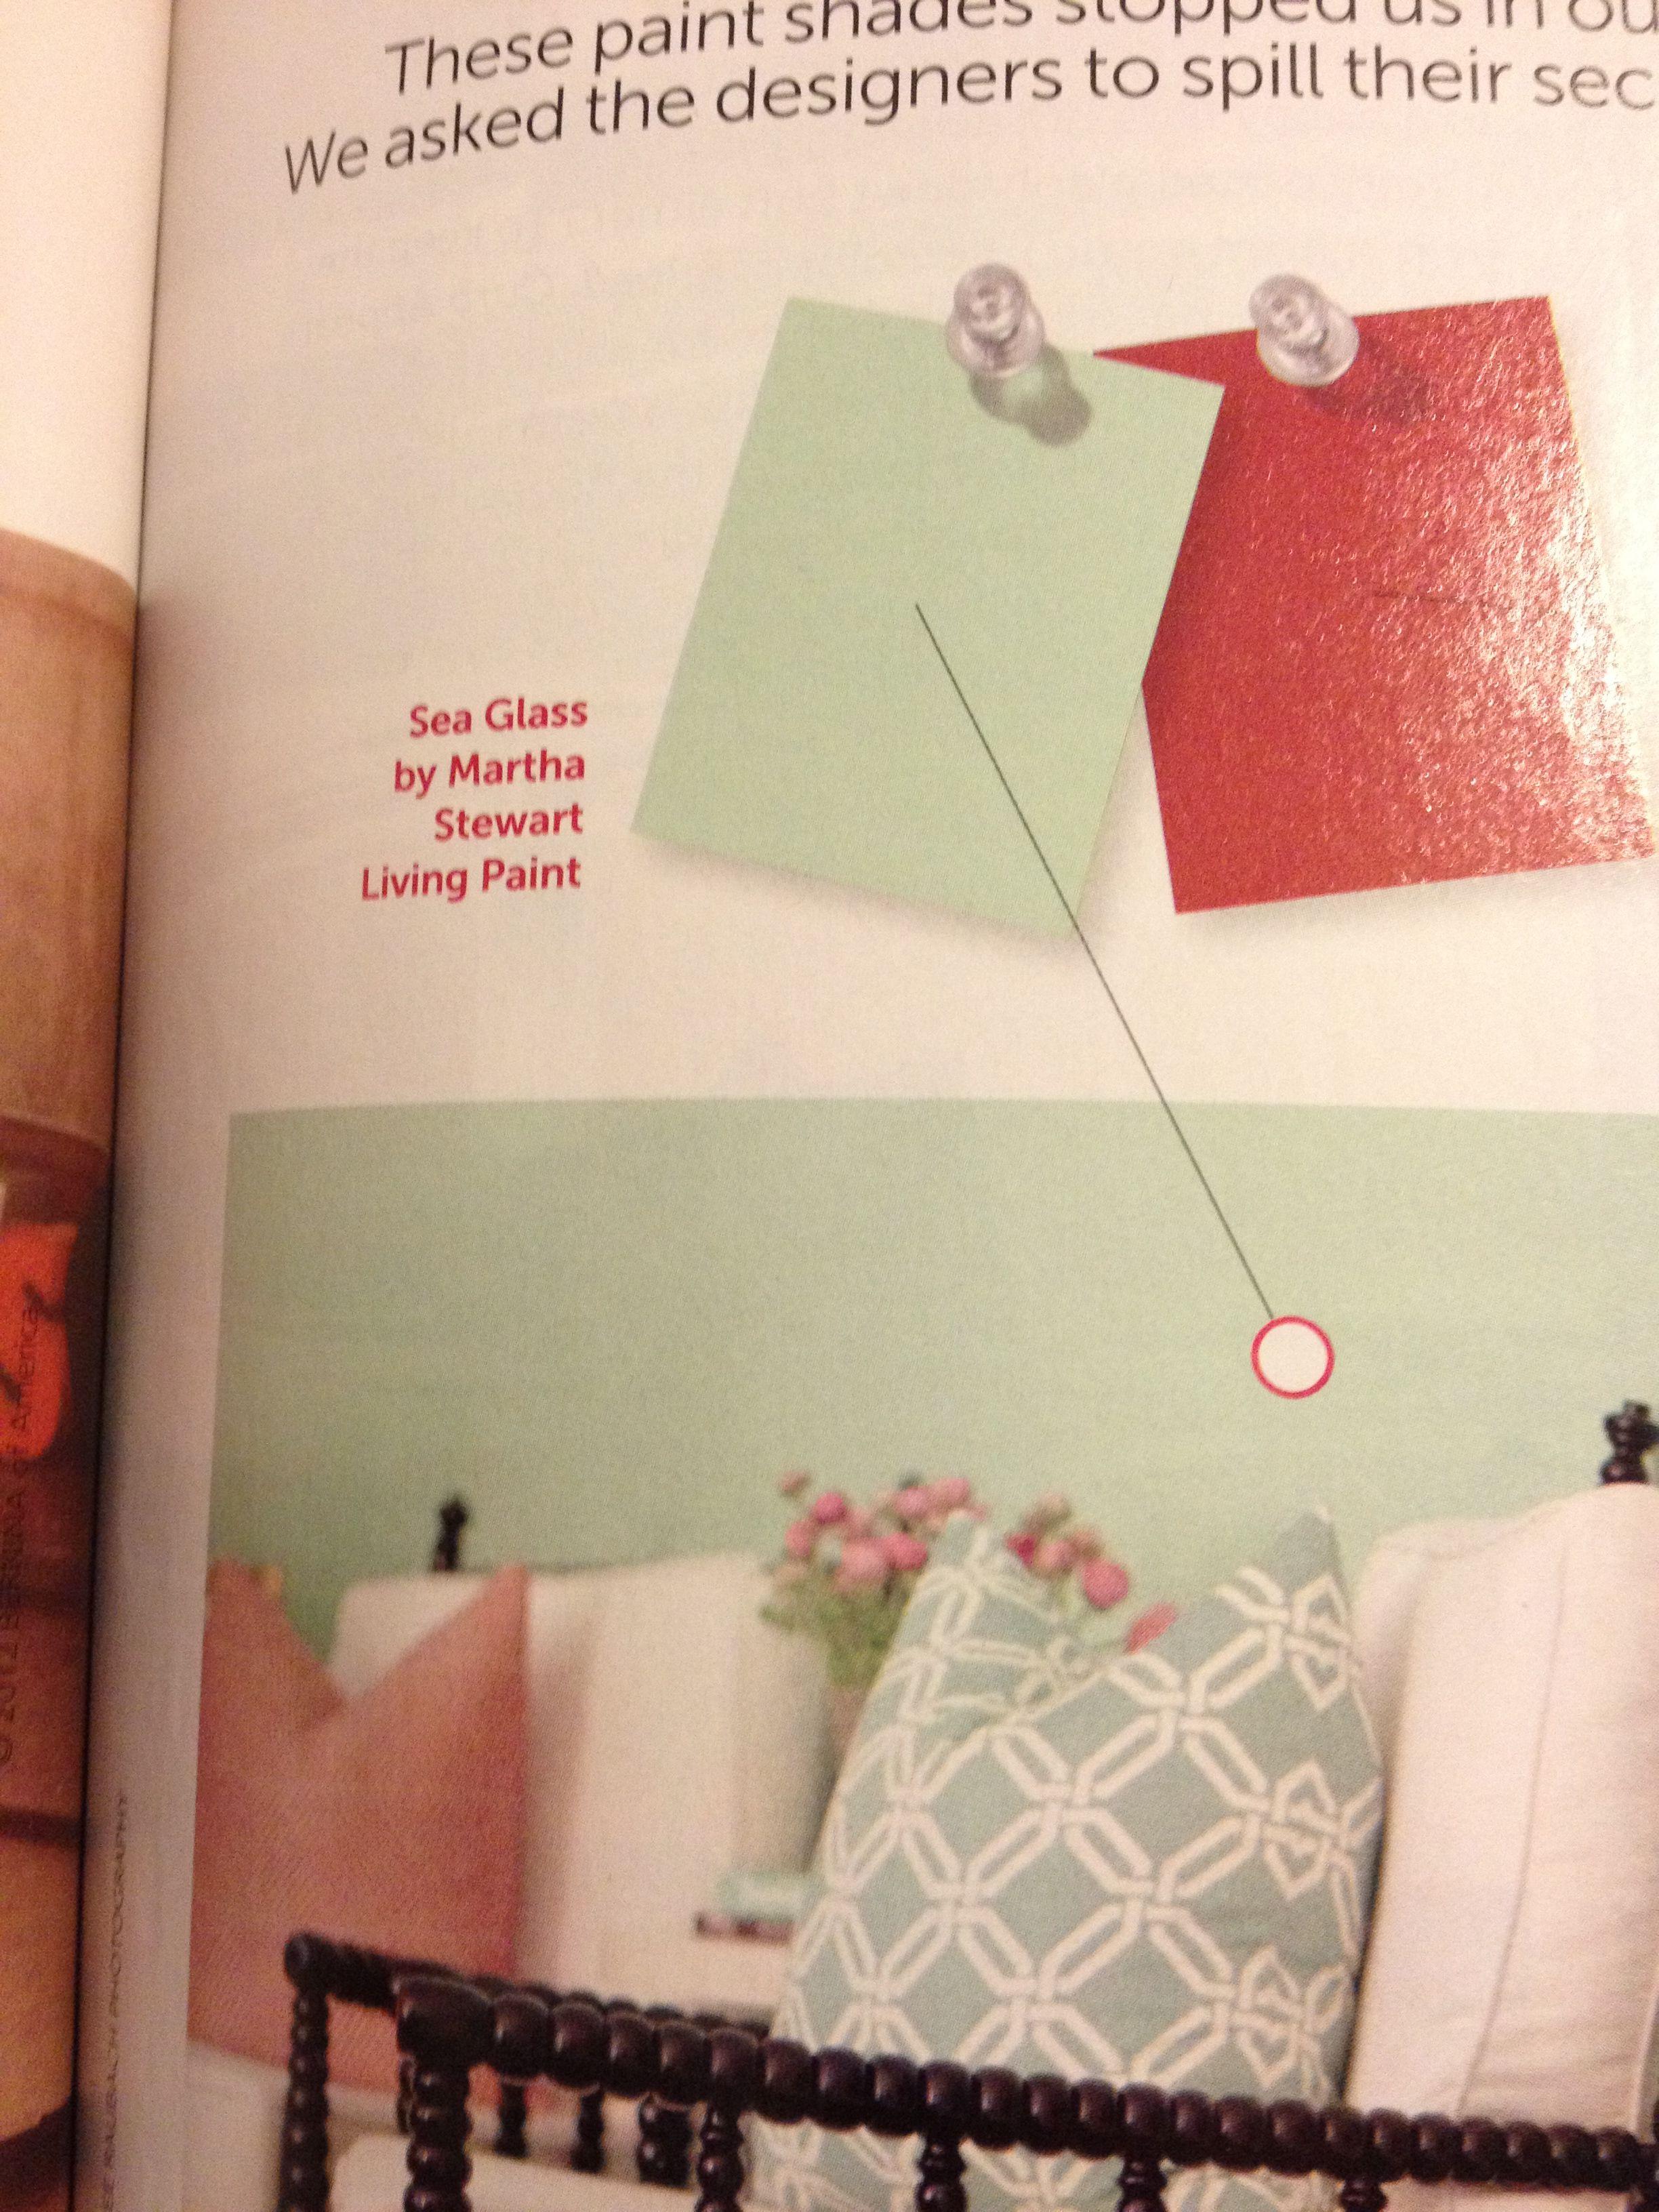 Martha Stewart Bedroom Colors Paint Color Sea Glass By Martha Stewart For The Home Random